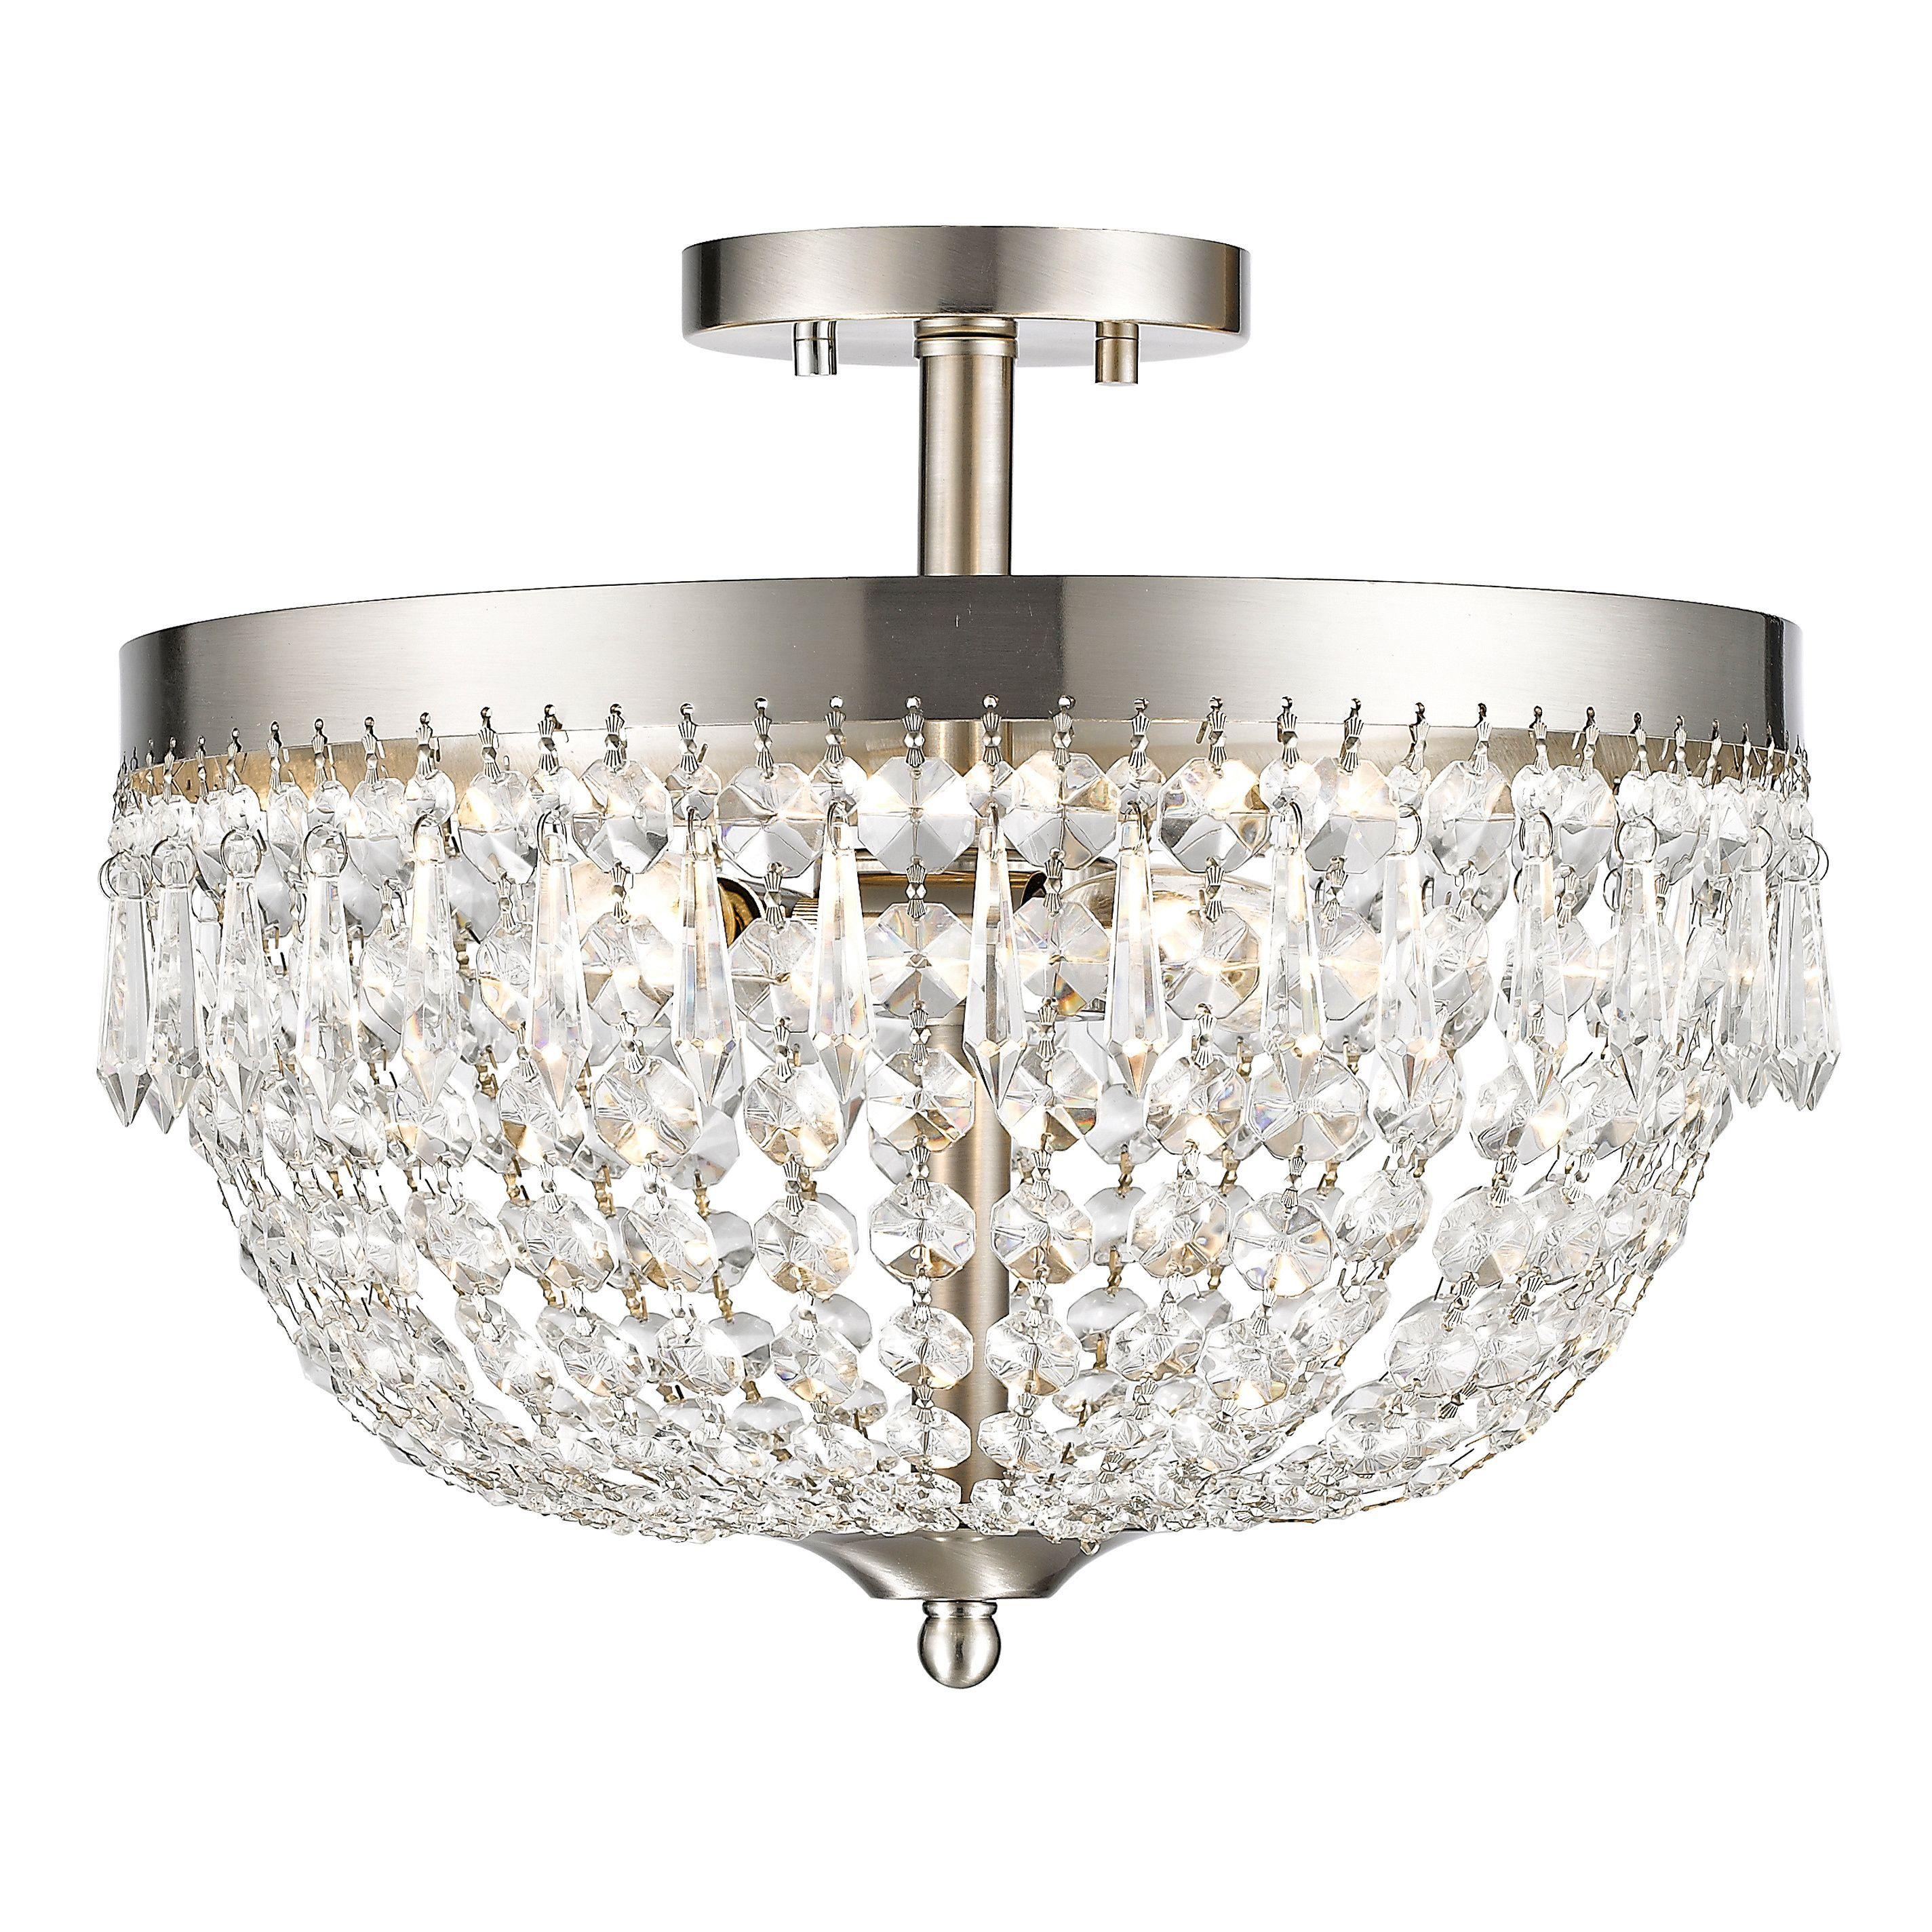 Z-Lite Danza 4-lights Brushed Nickel Semi Flush Mount (Flush Mounts) (Crystal)